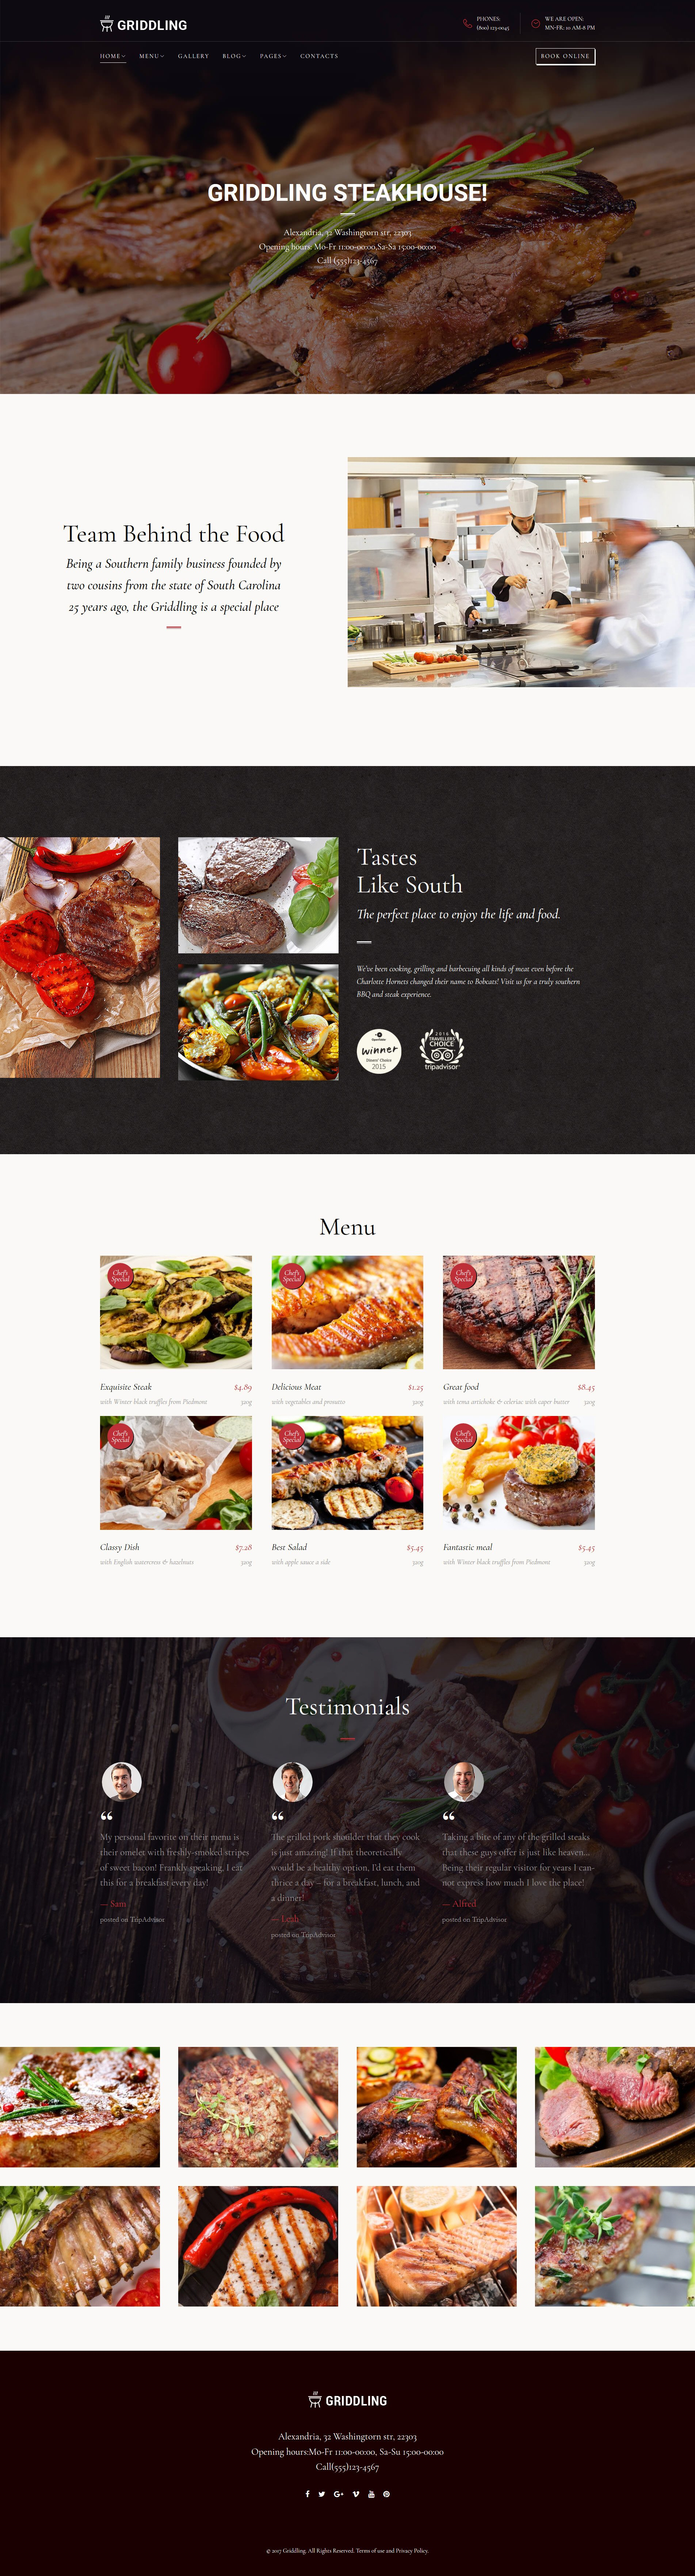 Griddling - Meat & Barbecue Restaurant WordPress Theme - screenshot